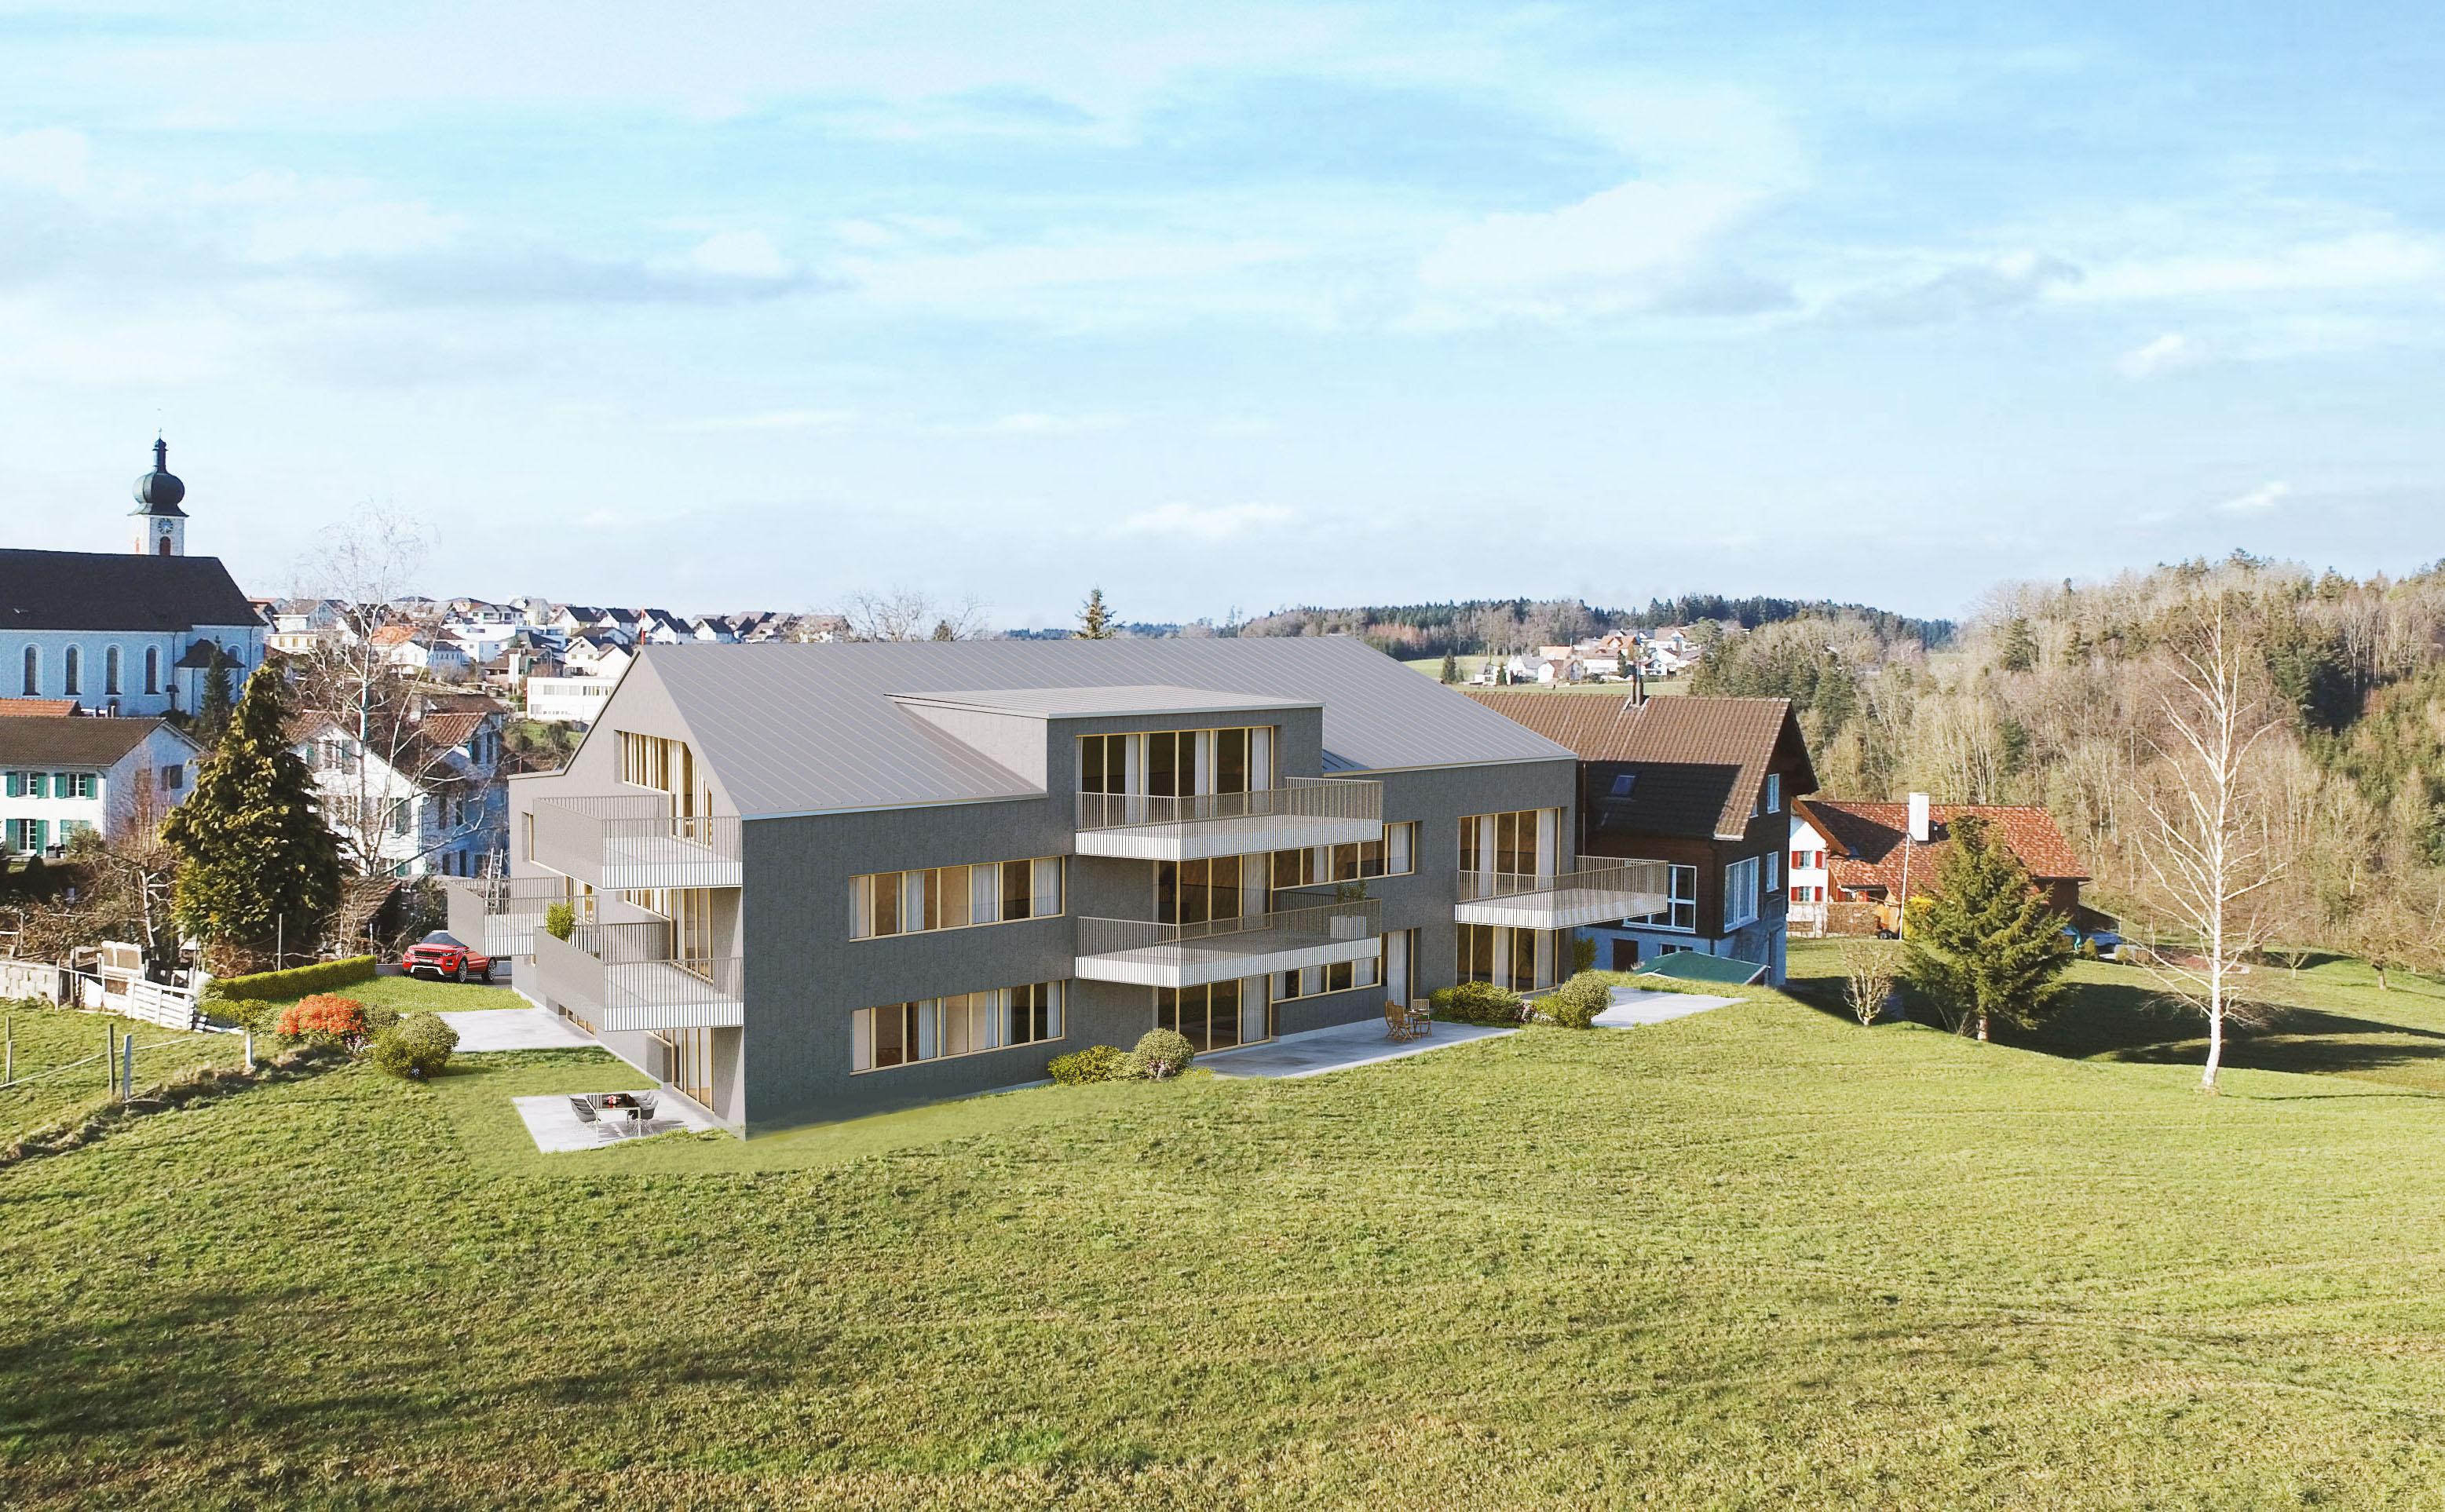 Das geplante Mehrfamilienhaus